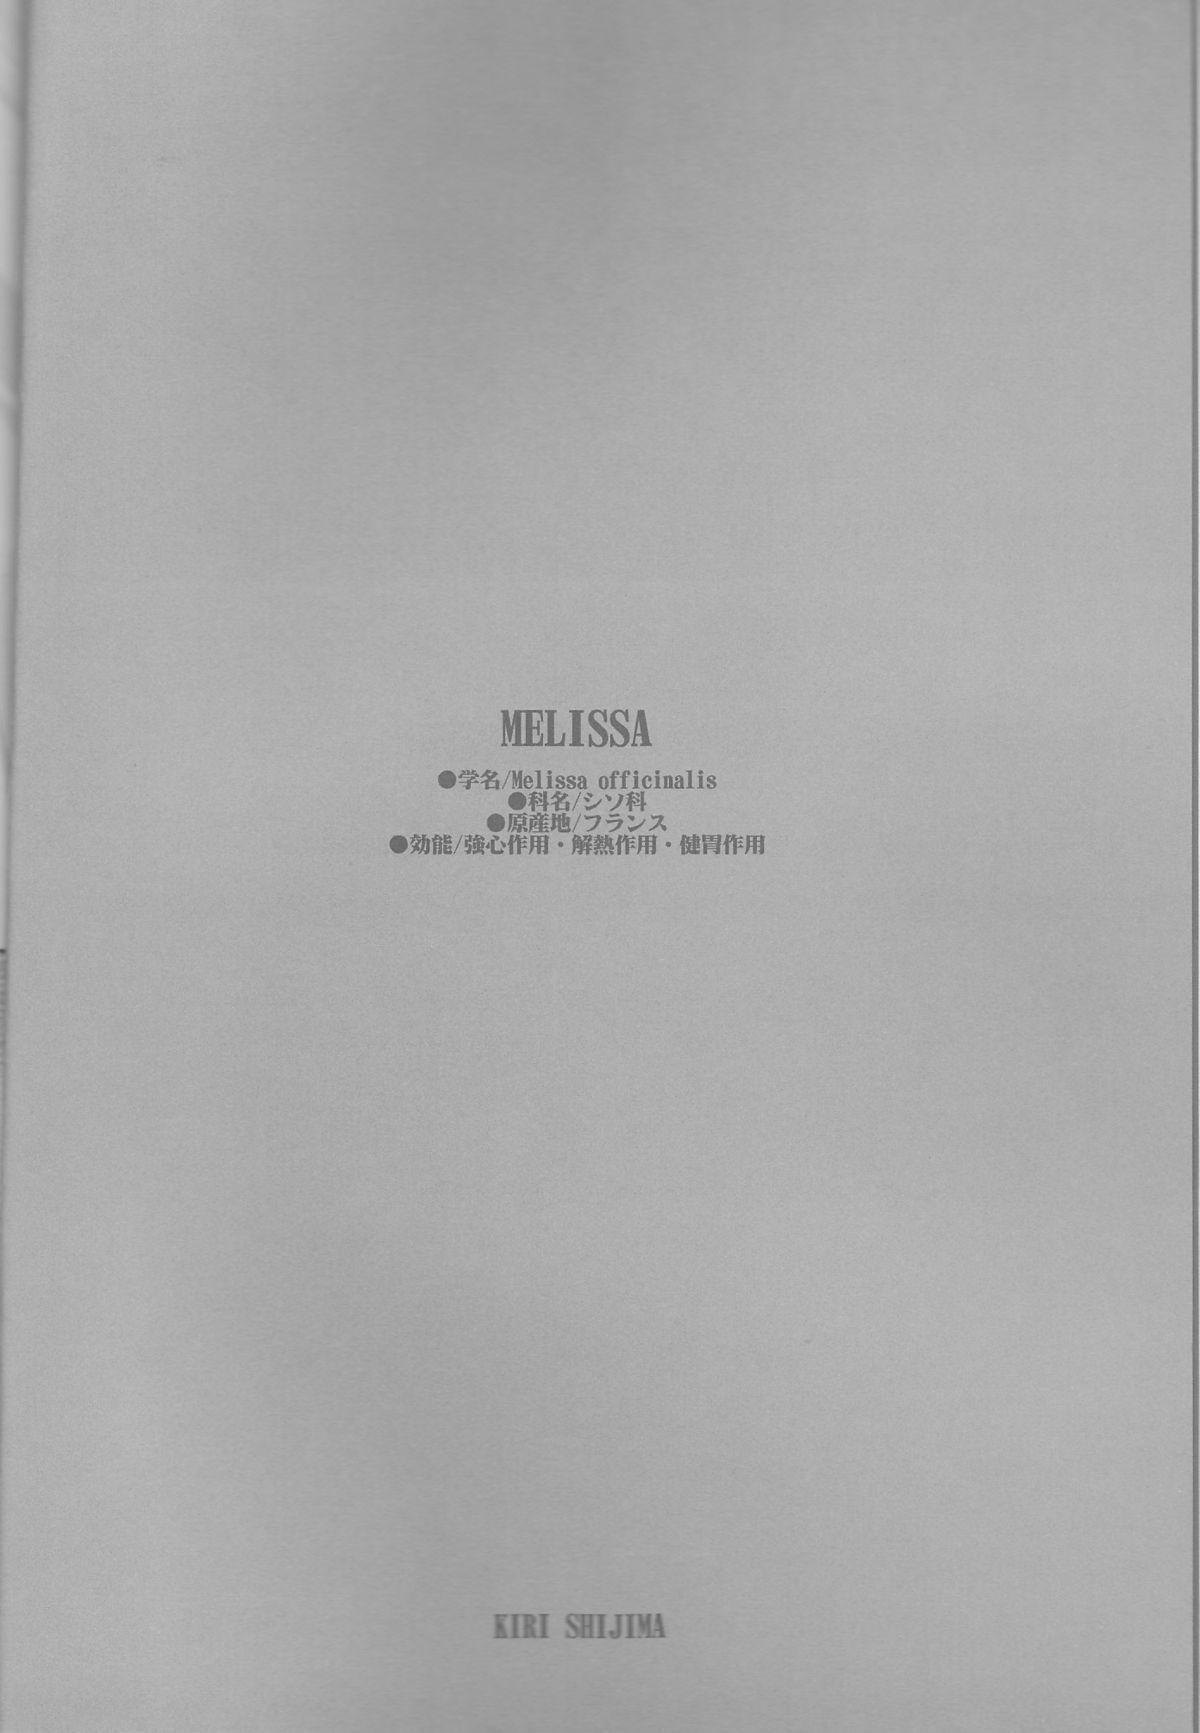 MELISSA 5